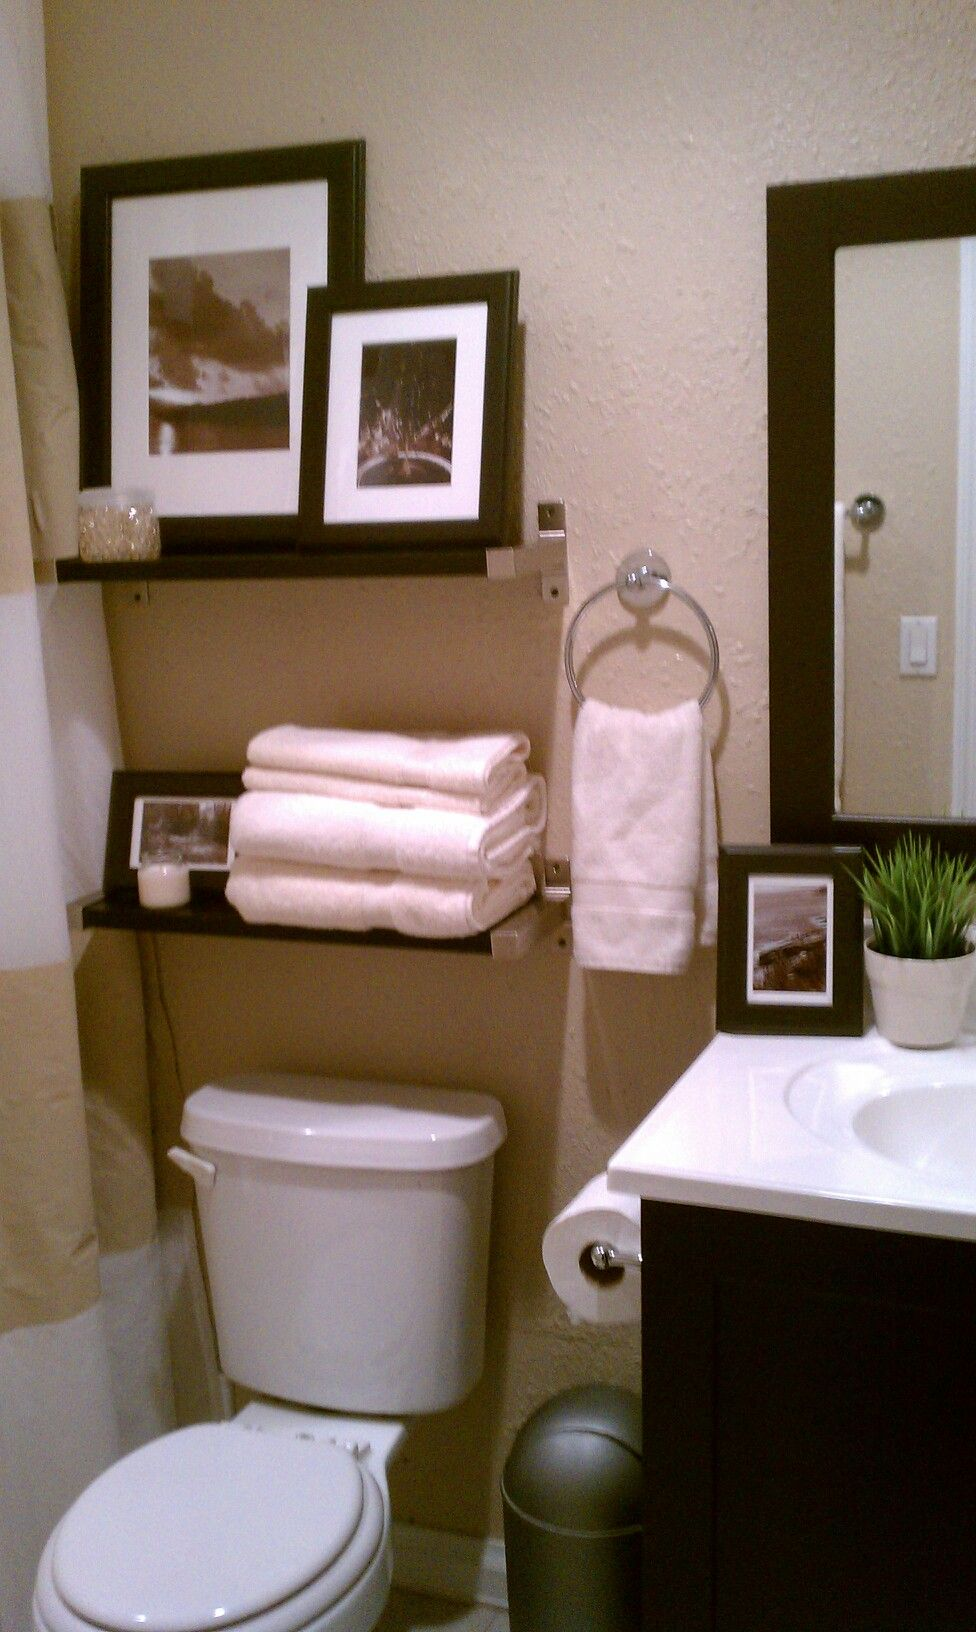 Bathroom Decor Frames : Bathroom decor i m trying to redo one and like the